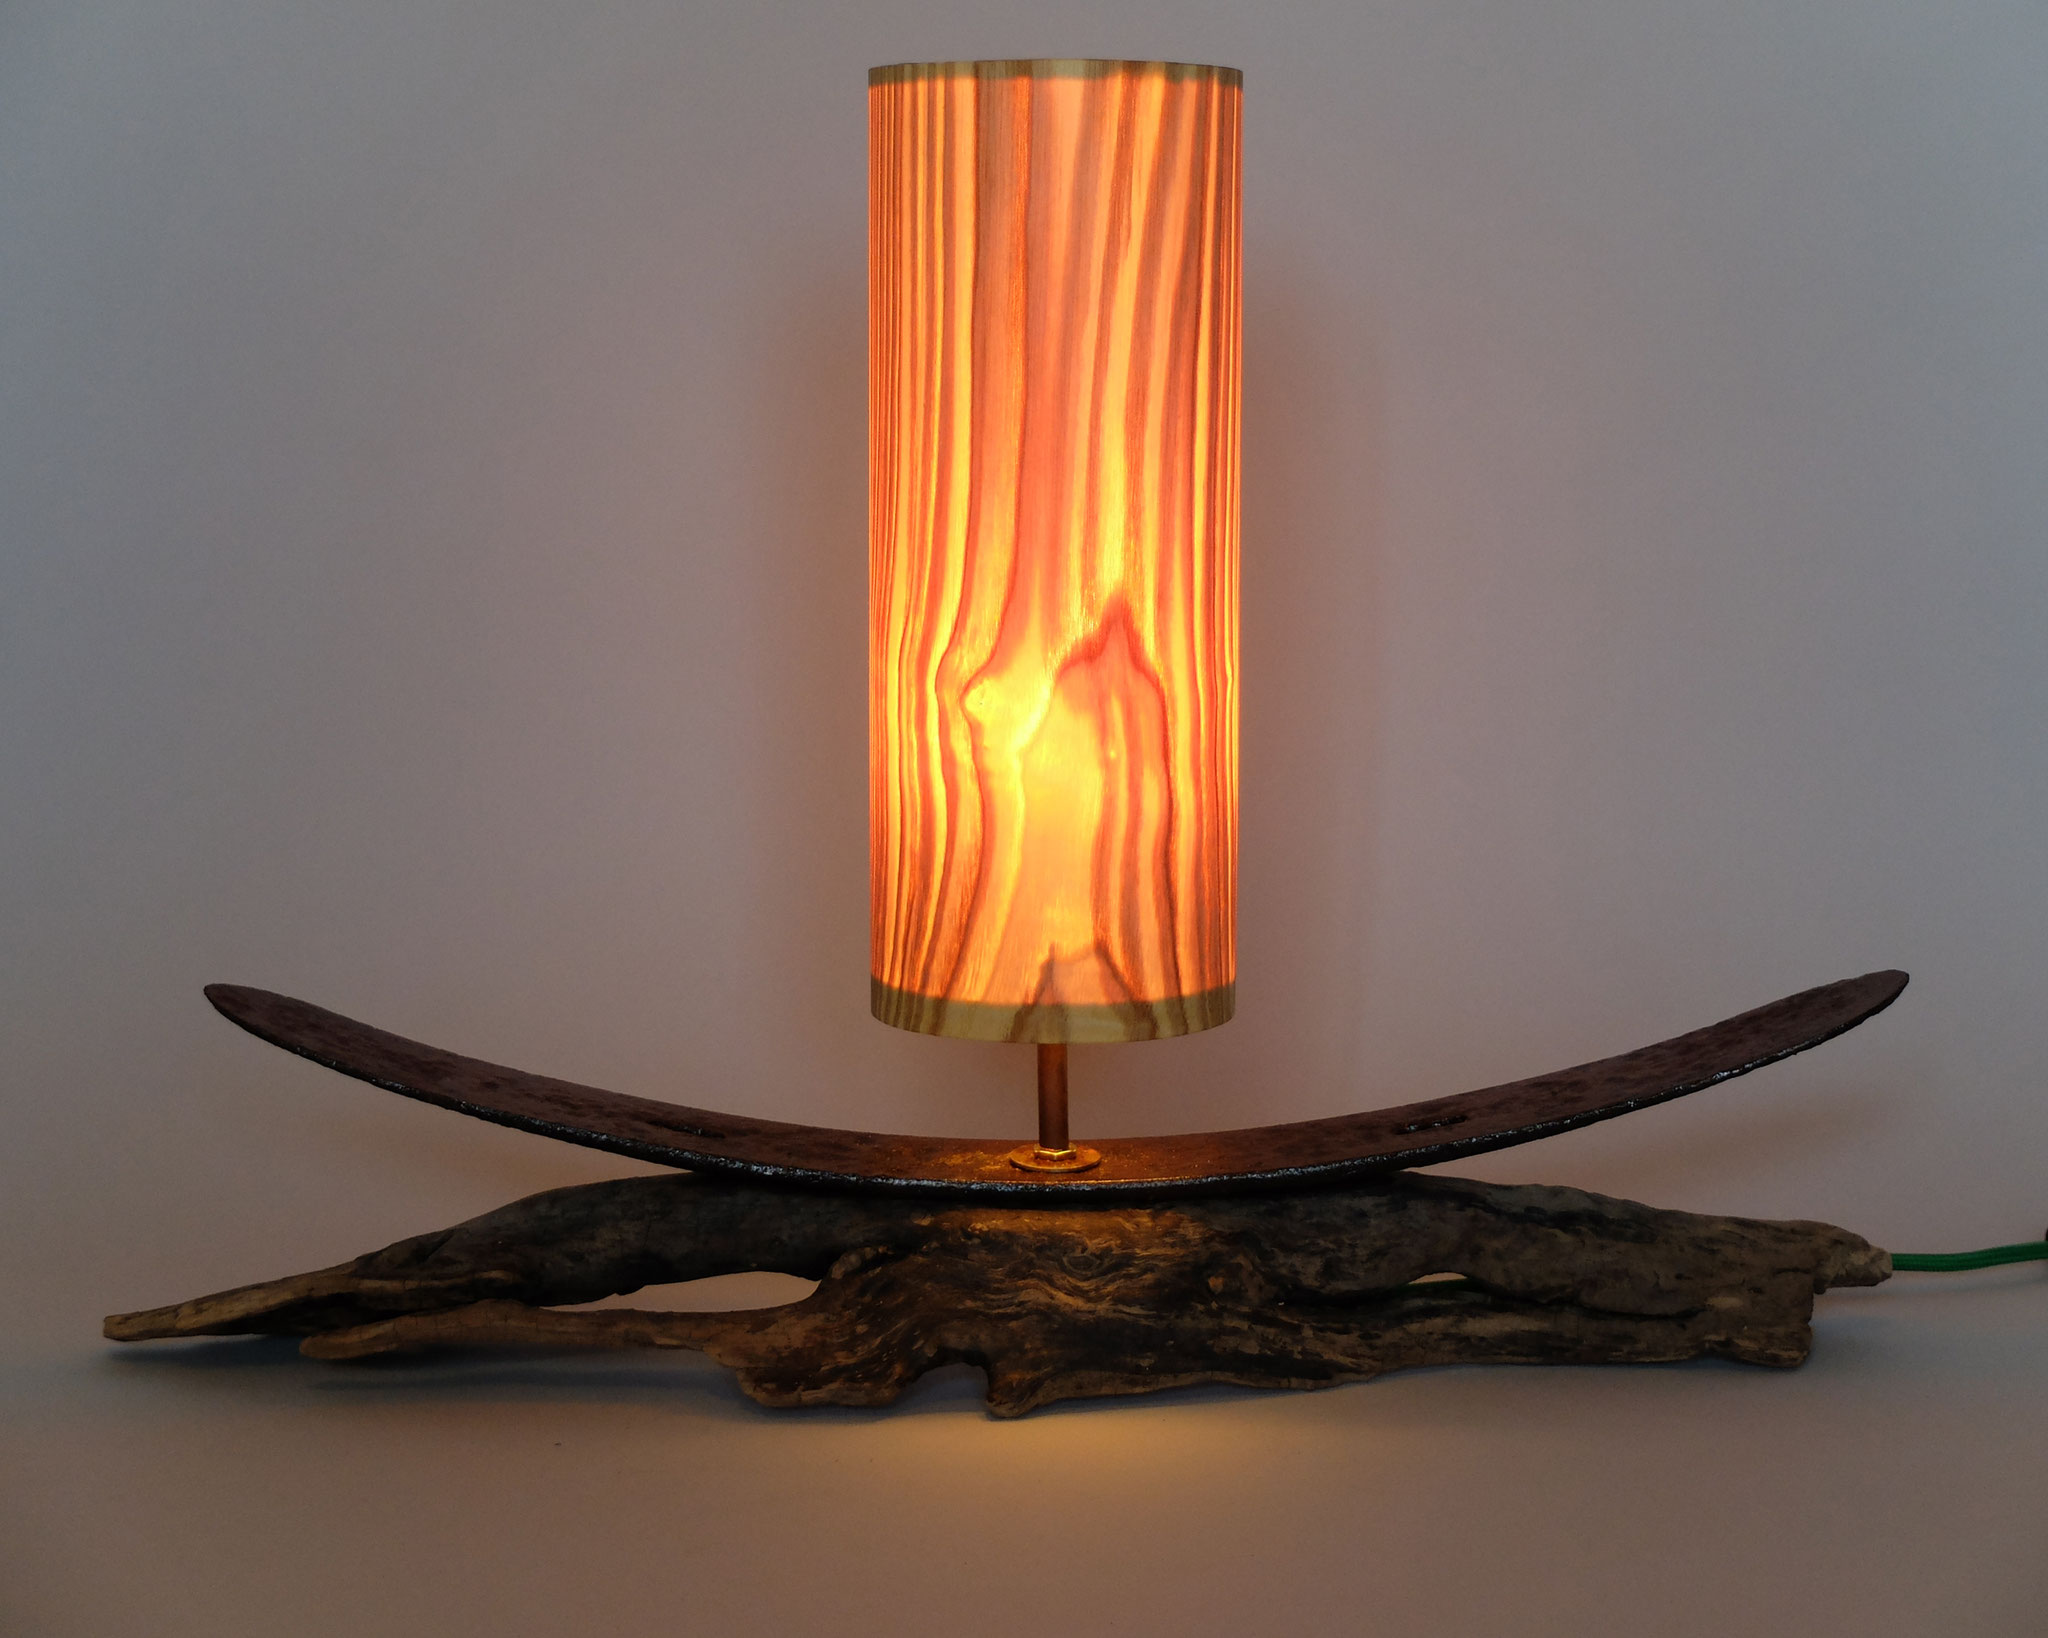 Upcycling Tischlampe Navis